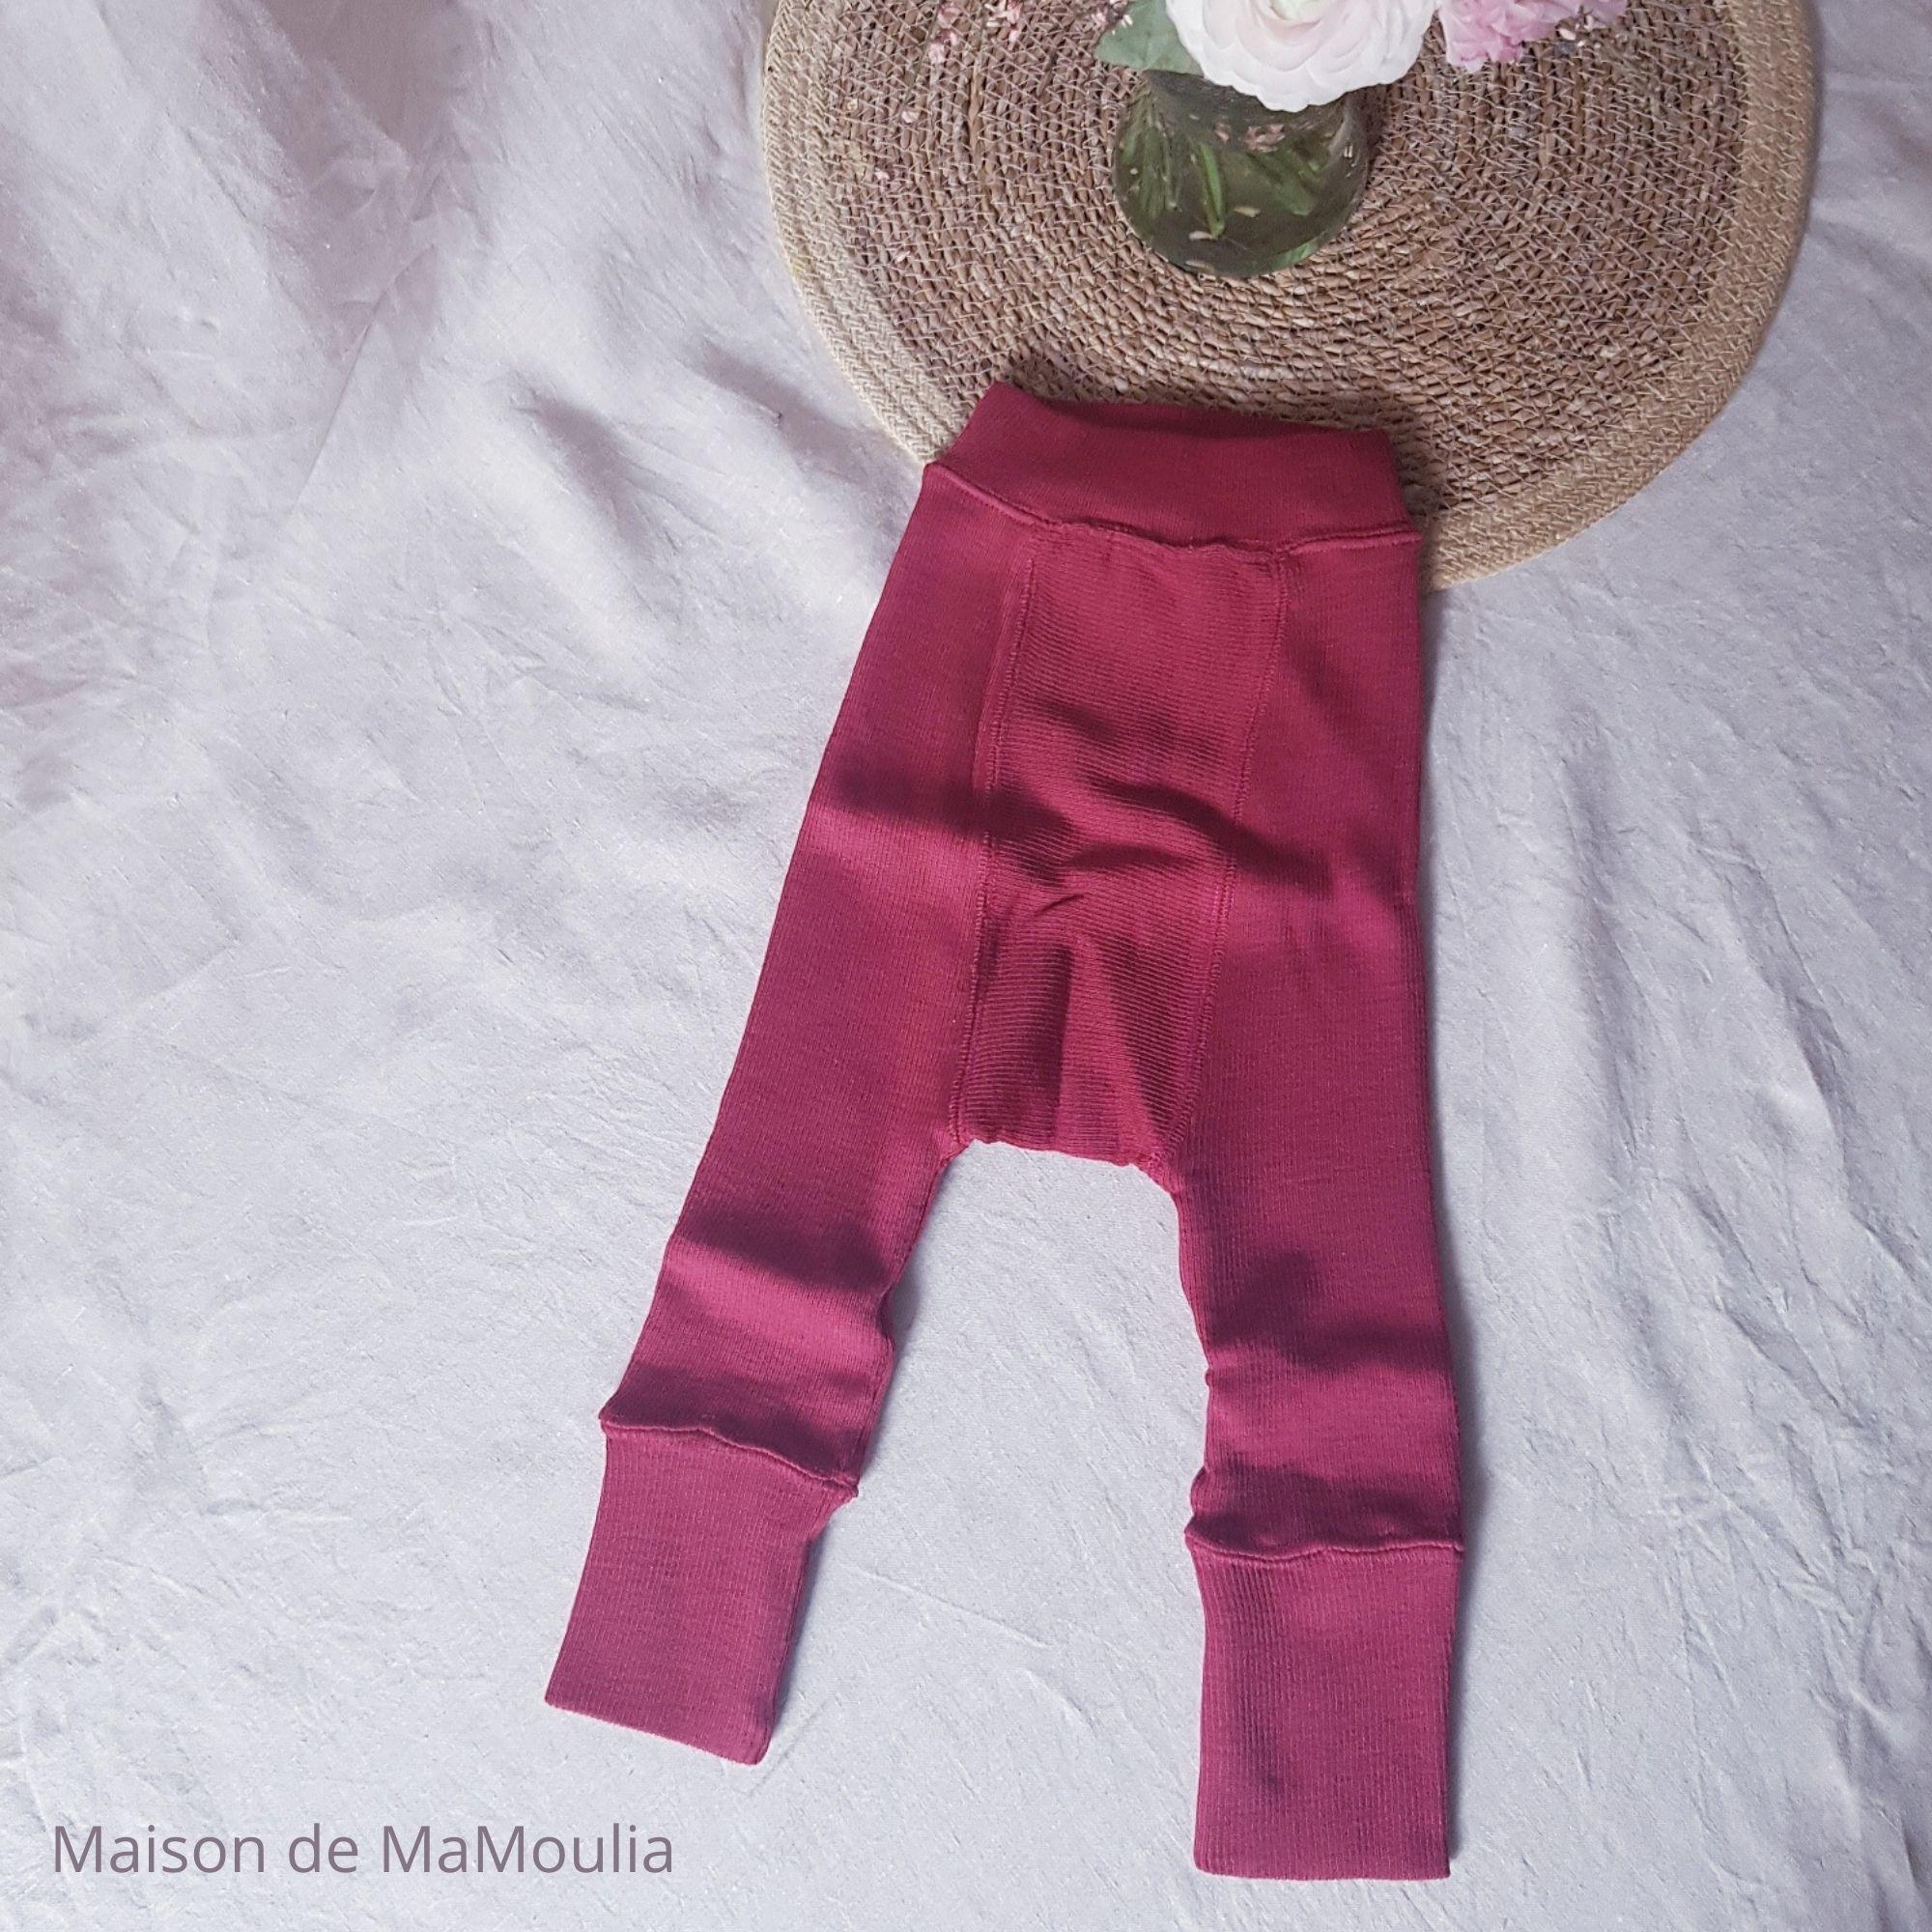 MANYMONTHS - LONGIES Pantalon Évolutif - 100% laine mérinos - Réversible - RASBERRY/POPPY RED